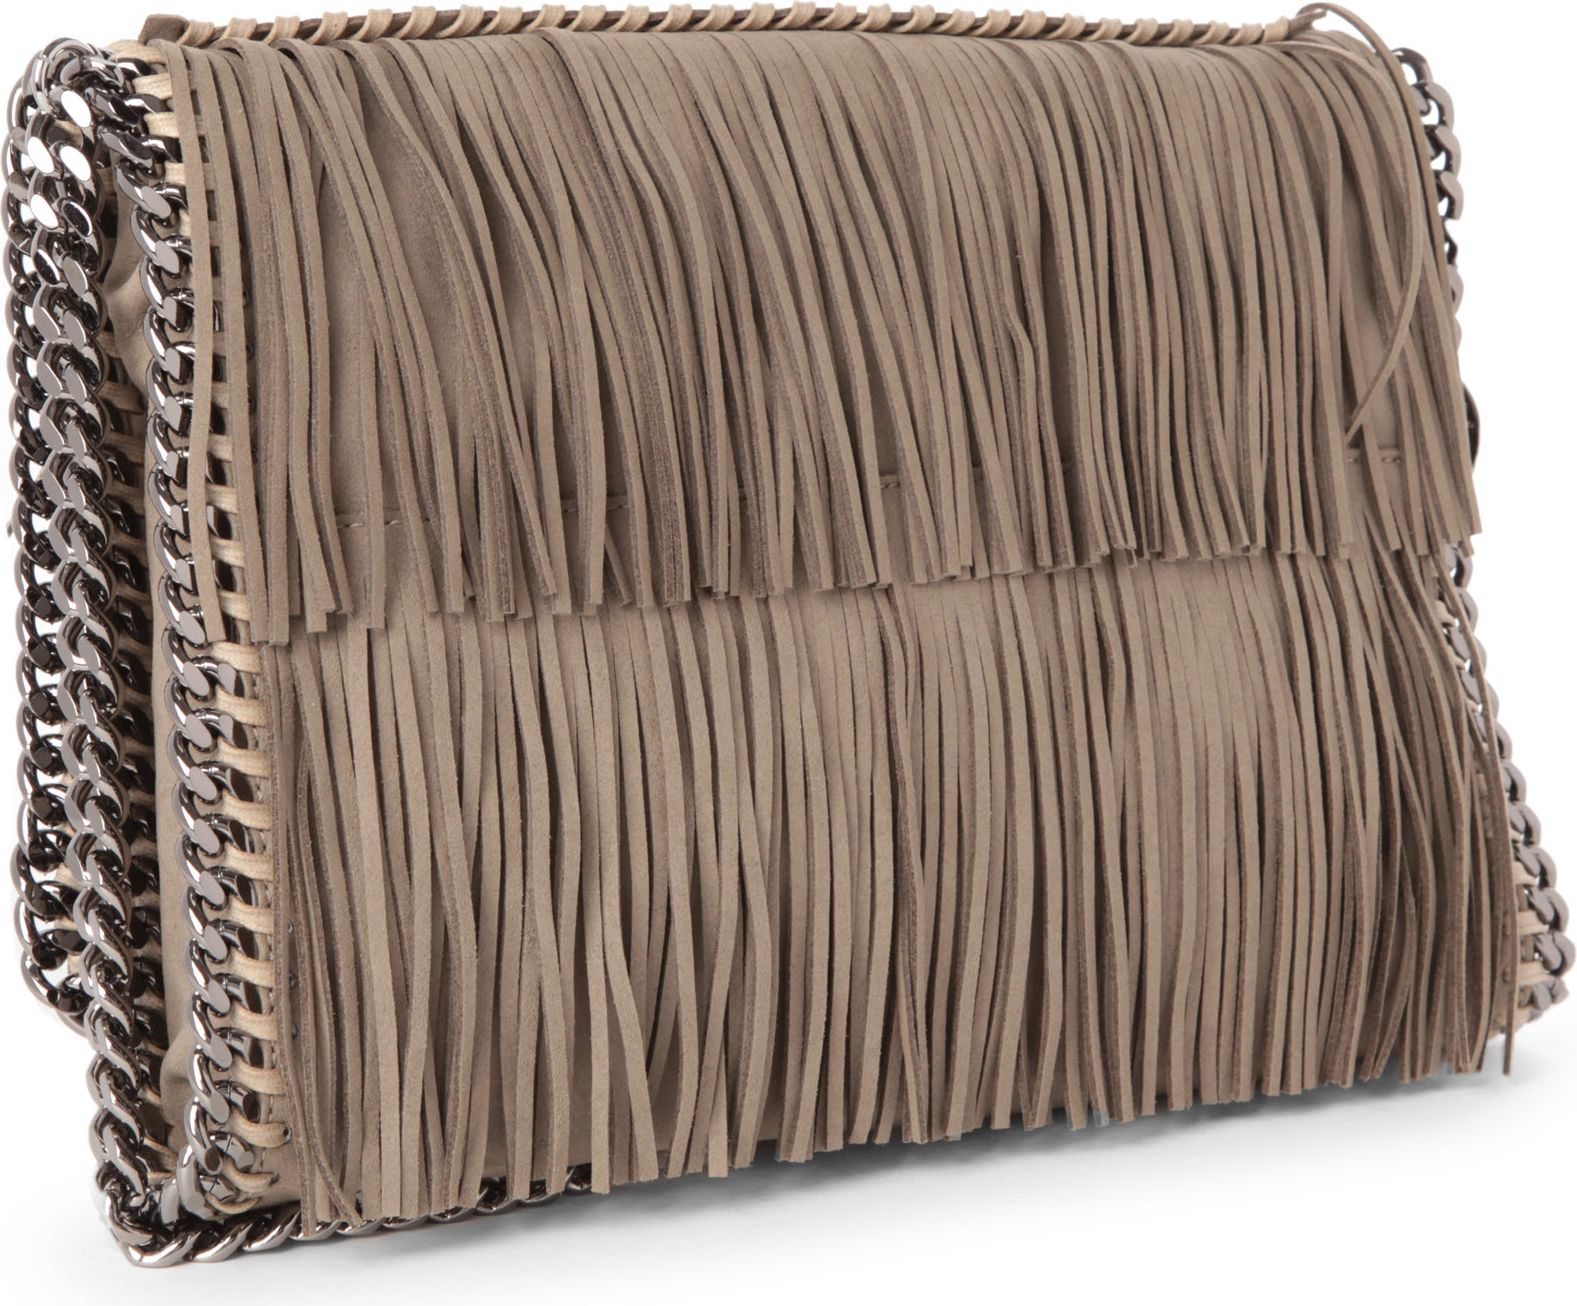 Stella McCartney Falabella Large Fringe Crossbody Bag in Taupe (Brown)